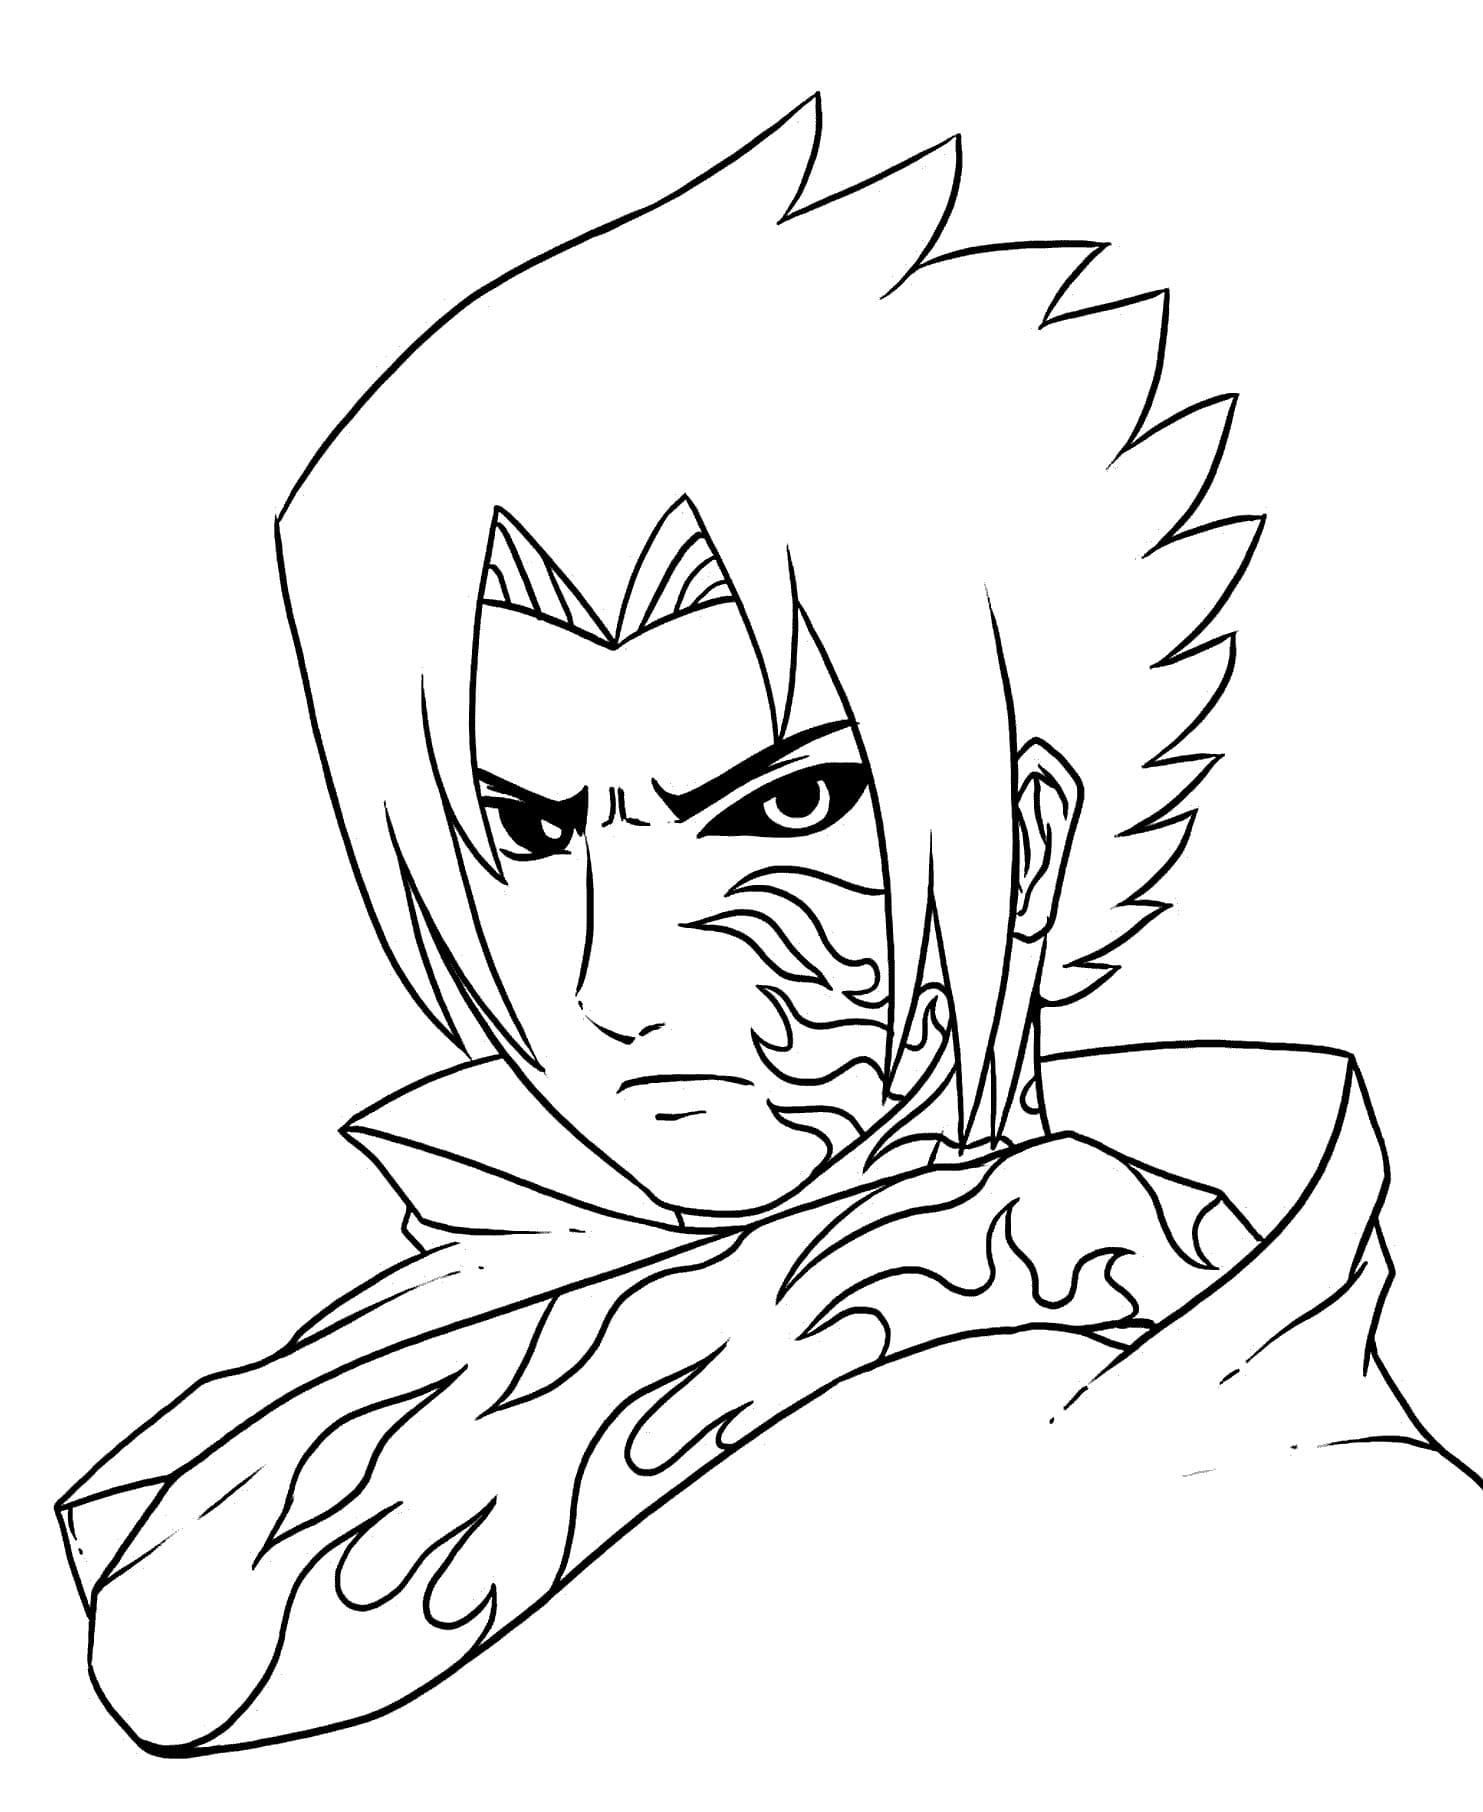 Sasuke Uchiha Naruto Ausmalbilder / Ausmalbilder Naruto 20